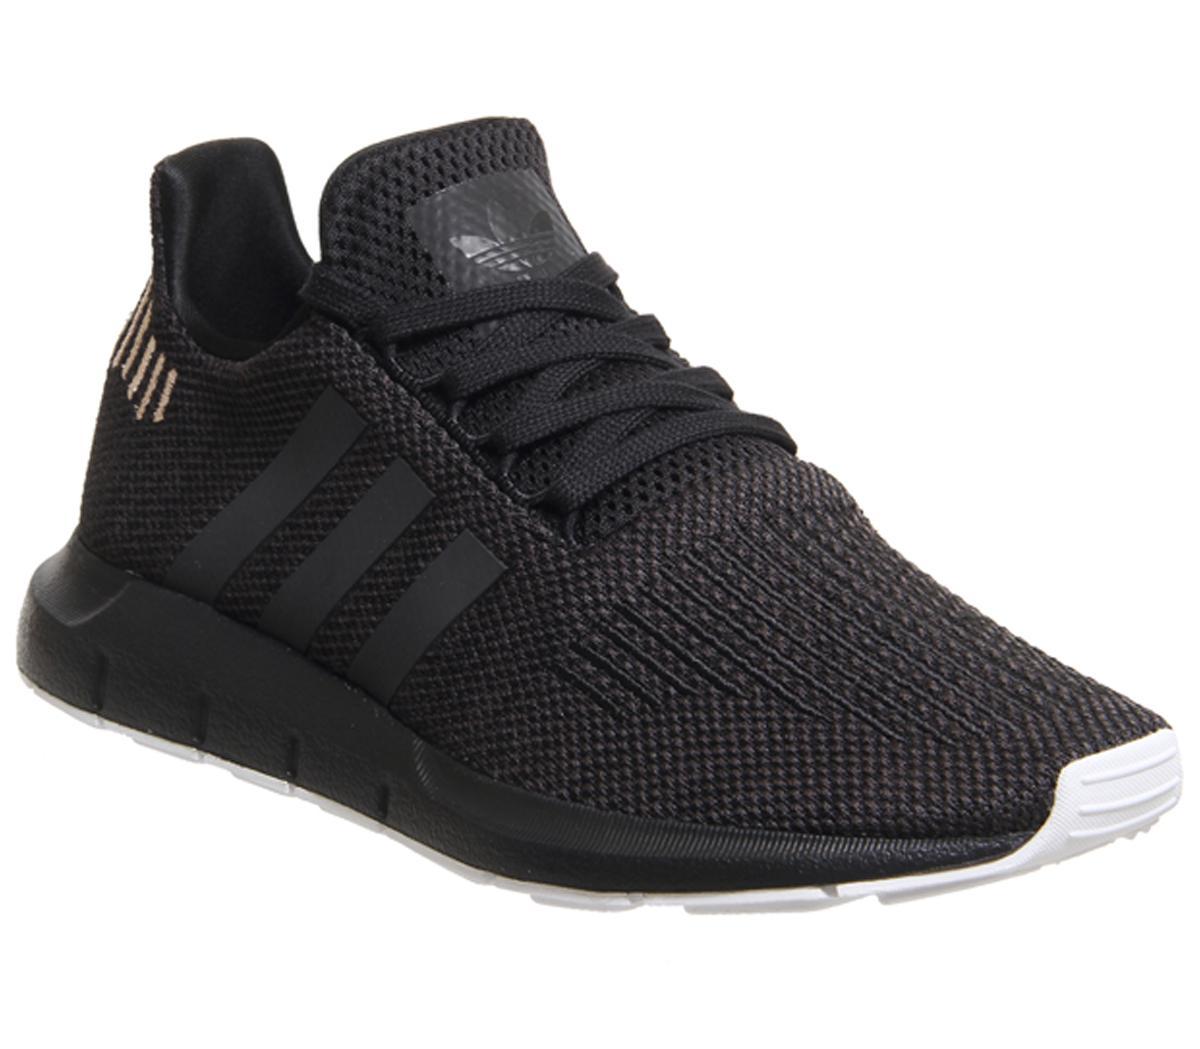 adidas Swift Run Trainers Core Black